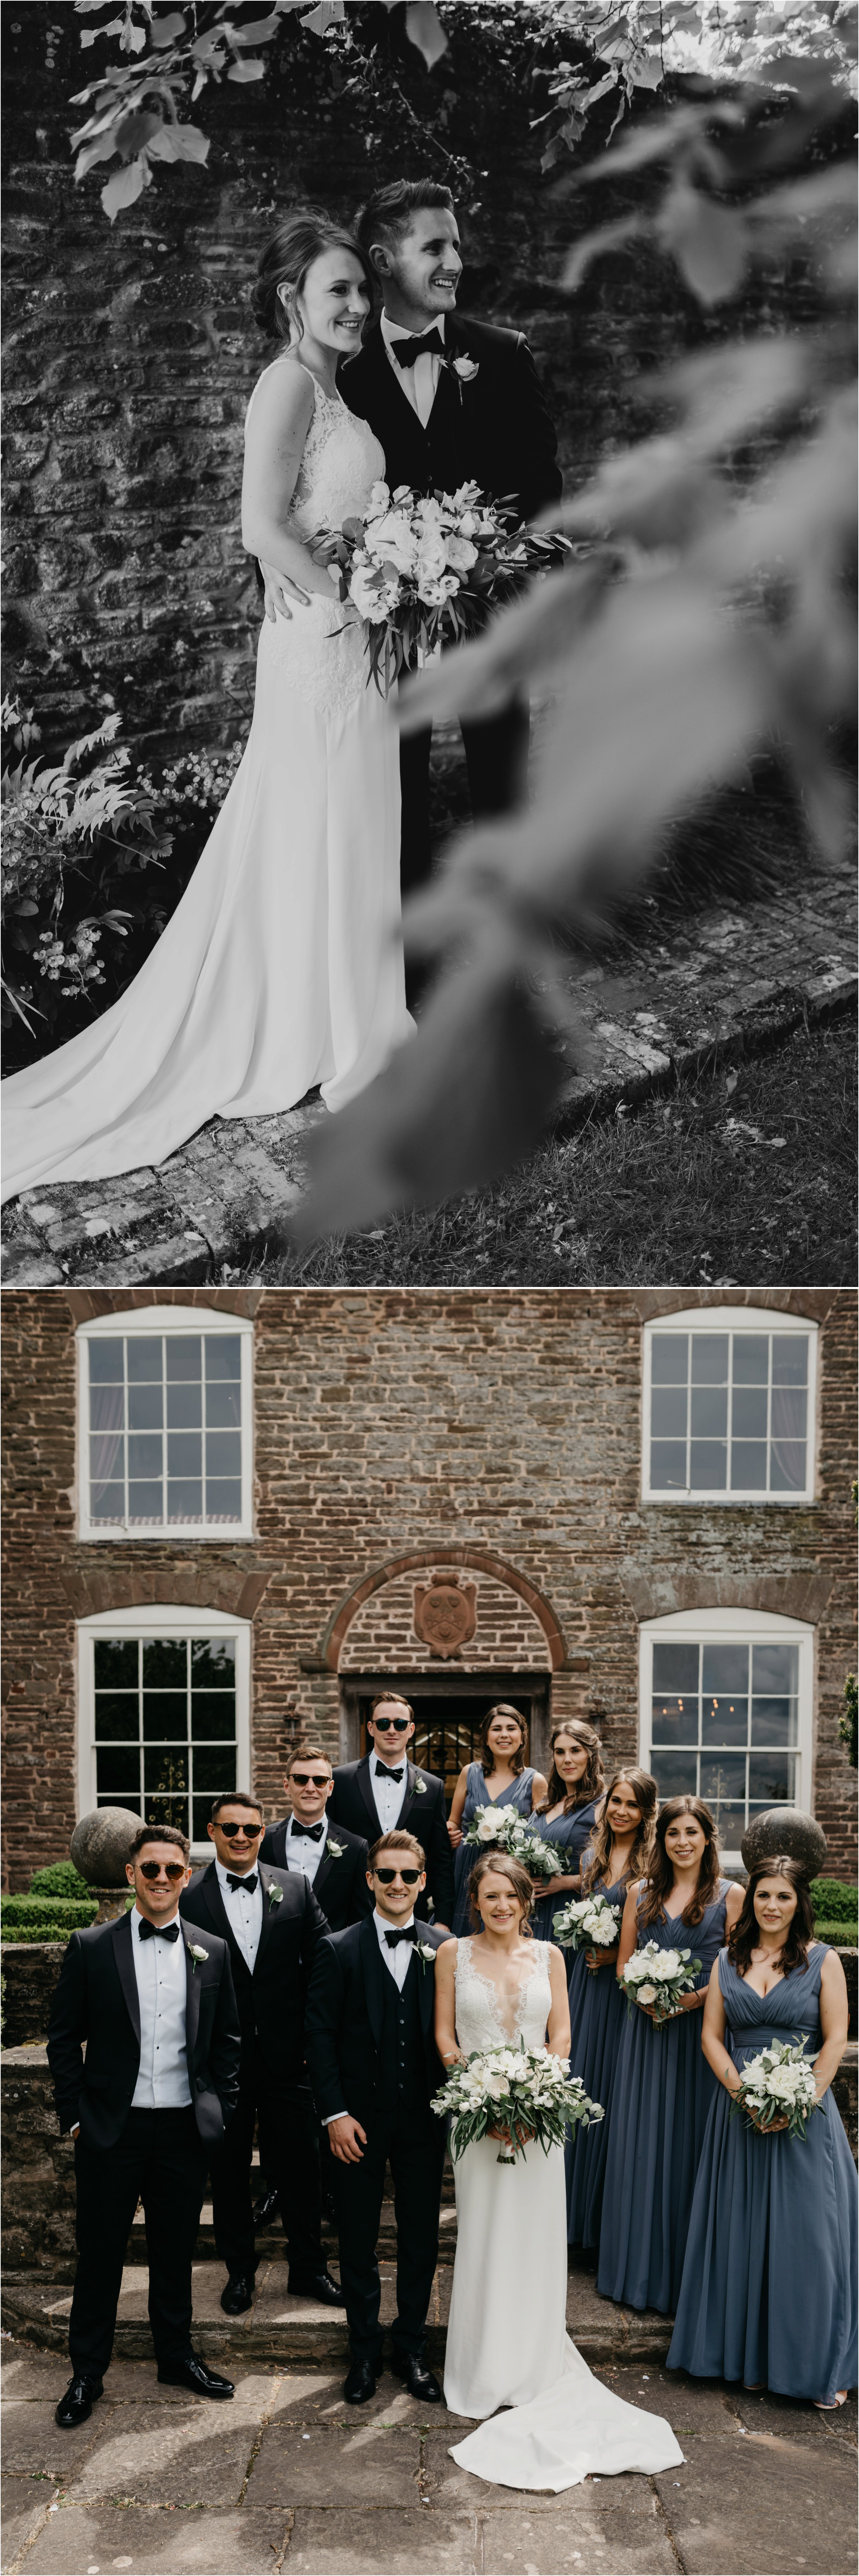 Dewsall Court Herefordshire wedding photographer_0075.jpg